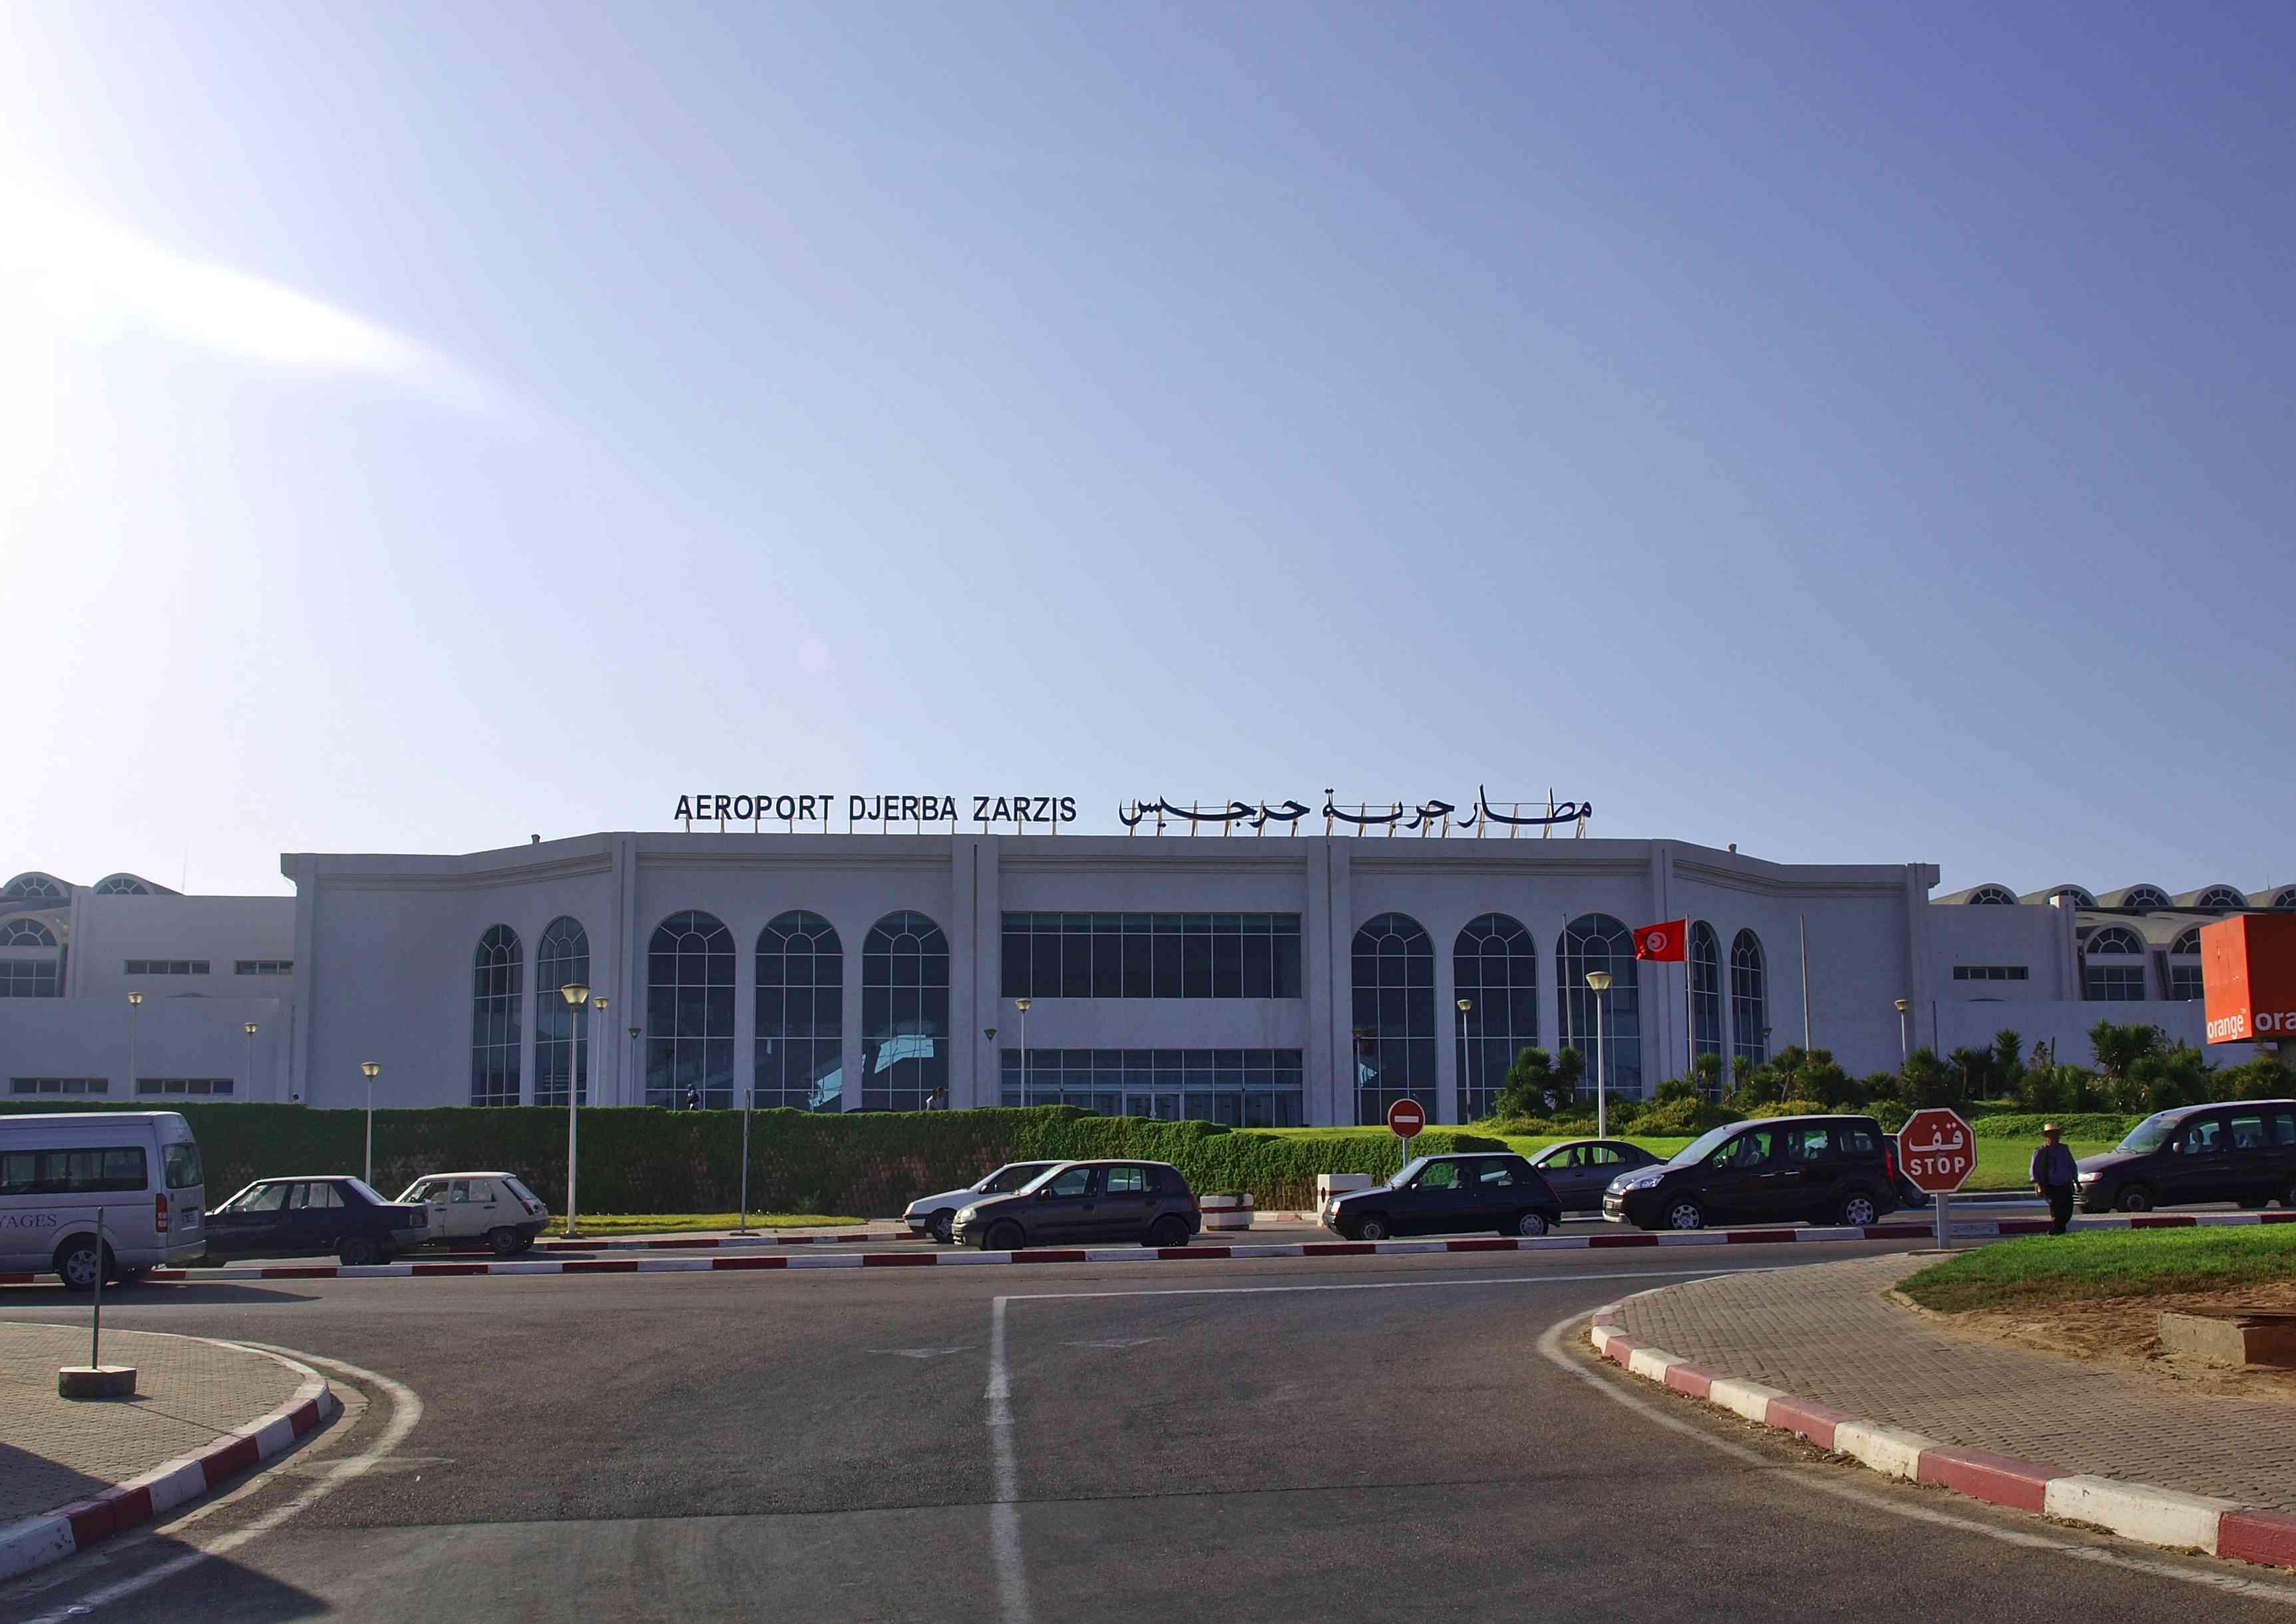 Djerba-Zarzis International Airport